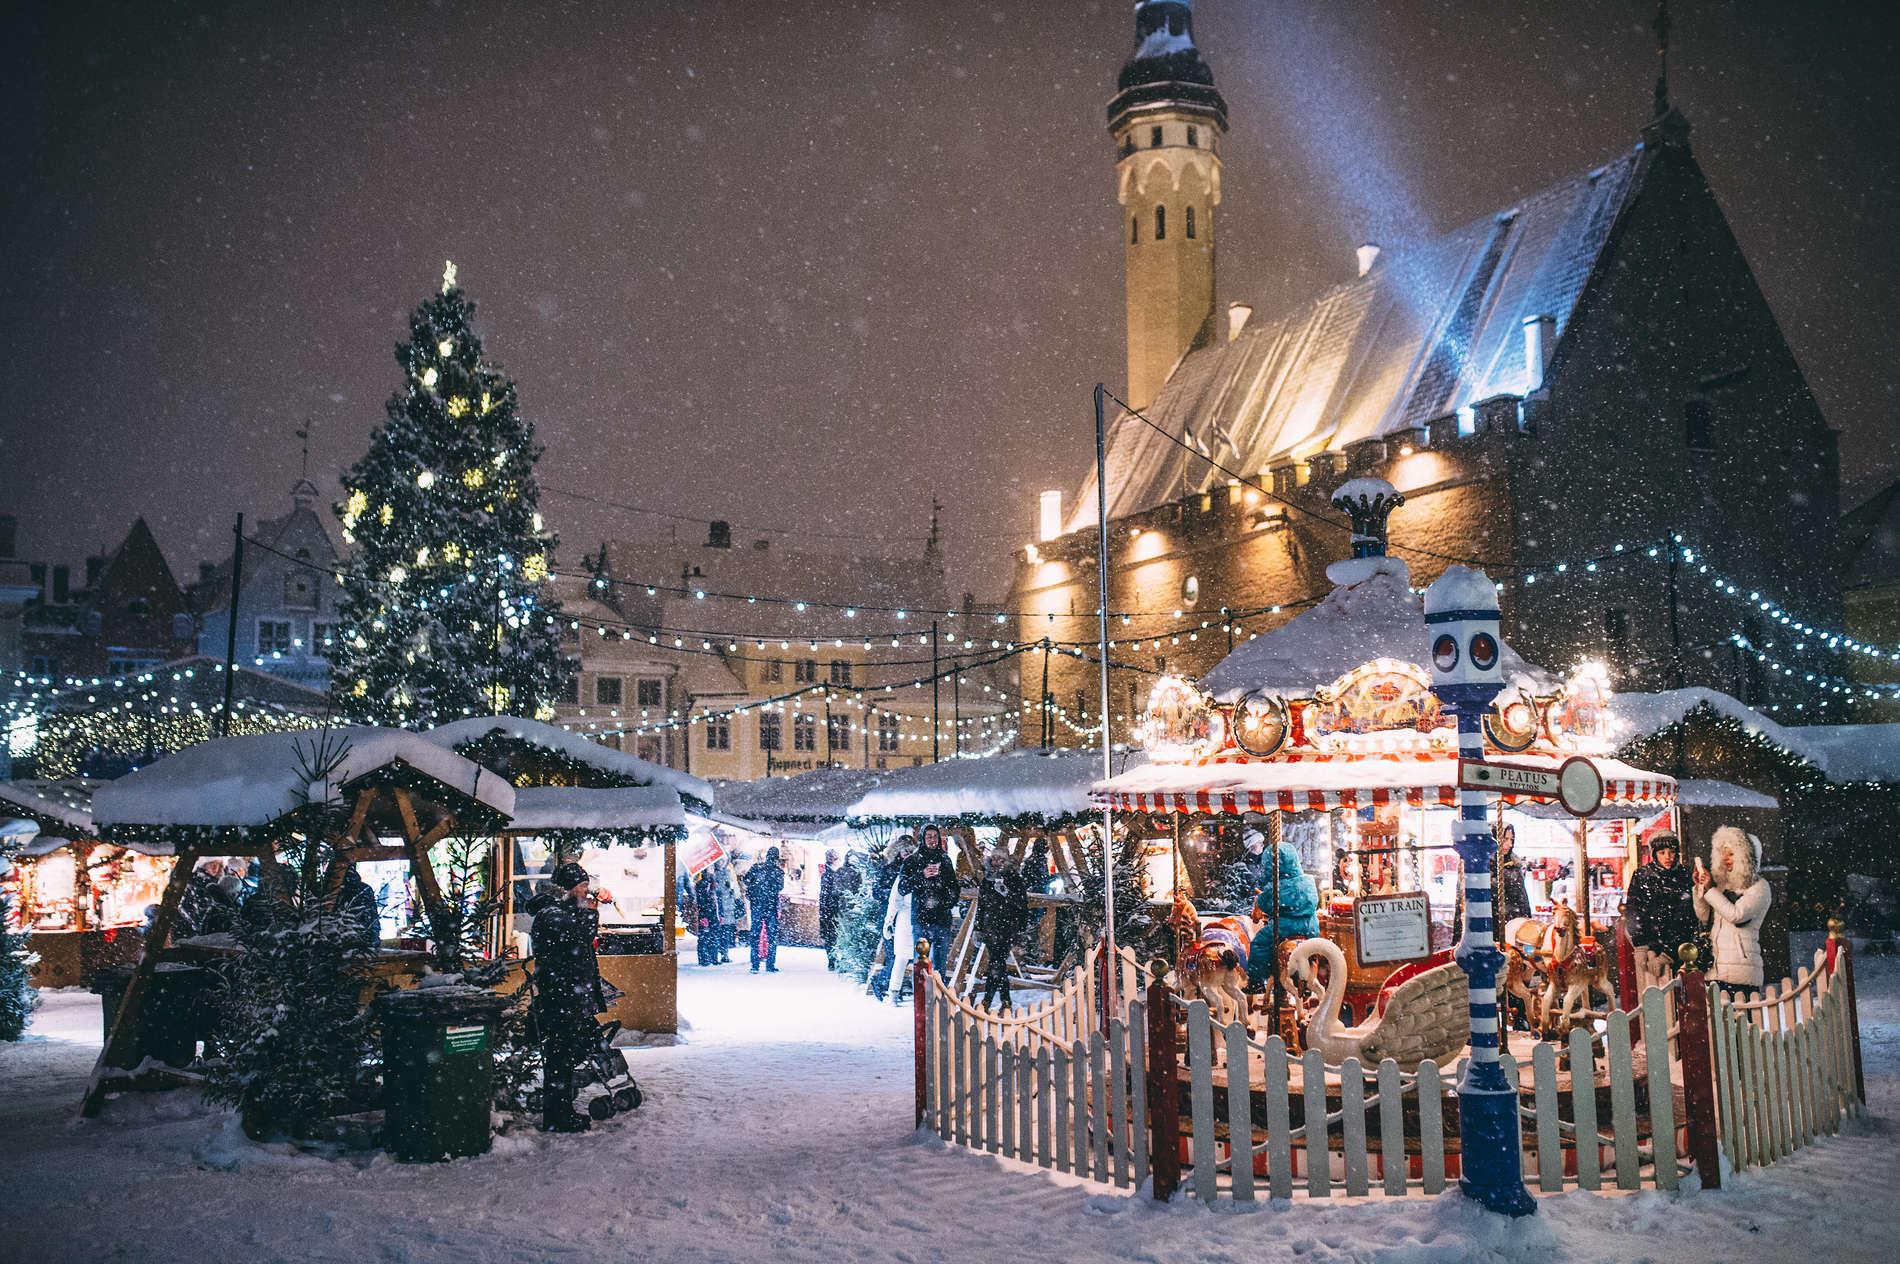 Carousel at the Christmas Market of Tallinn, Estonia. Photo by: Jake Farra